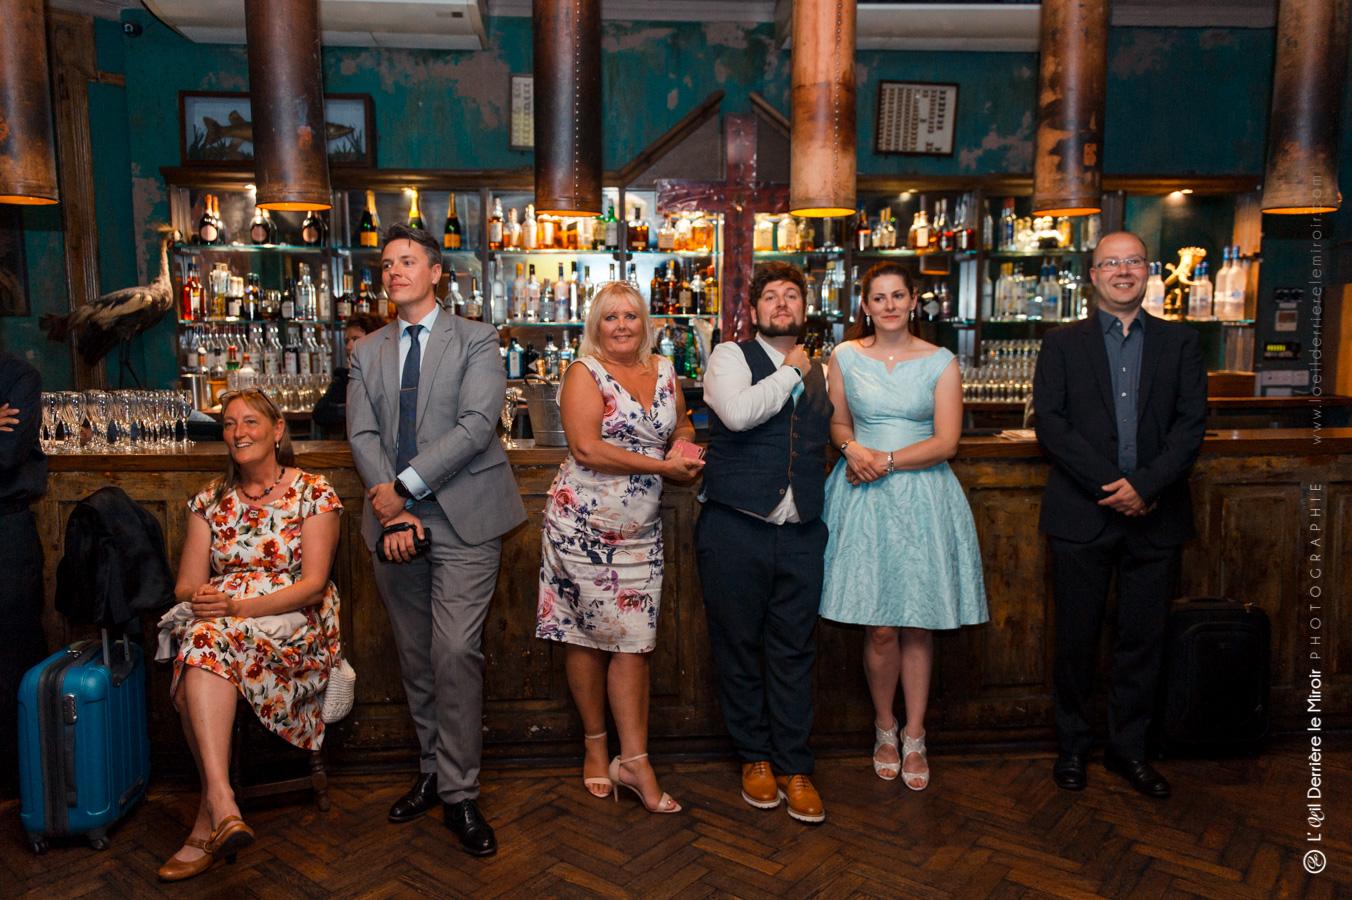 Destination-wedding-photographer-london-AG-068